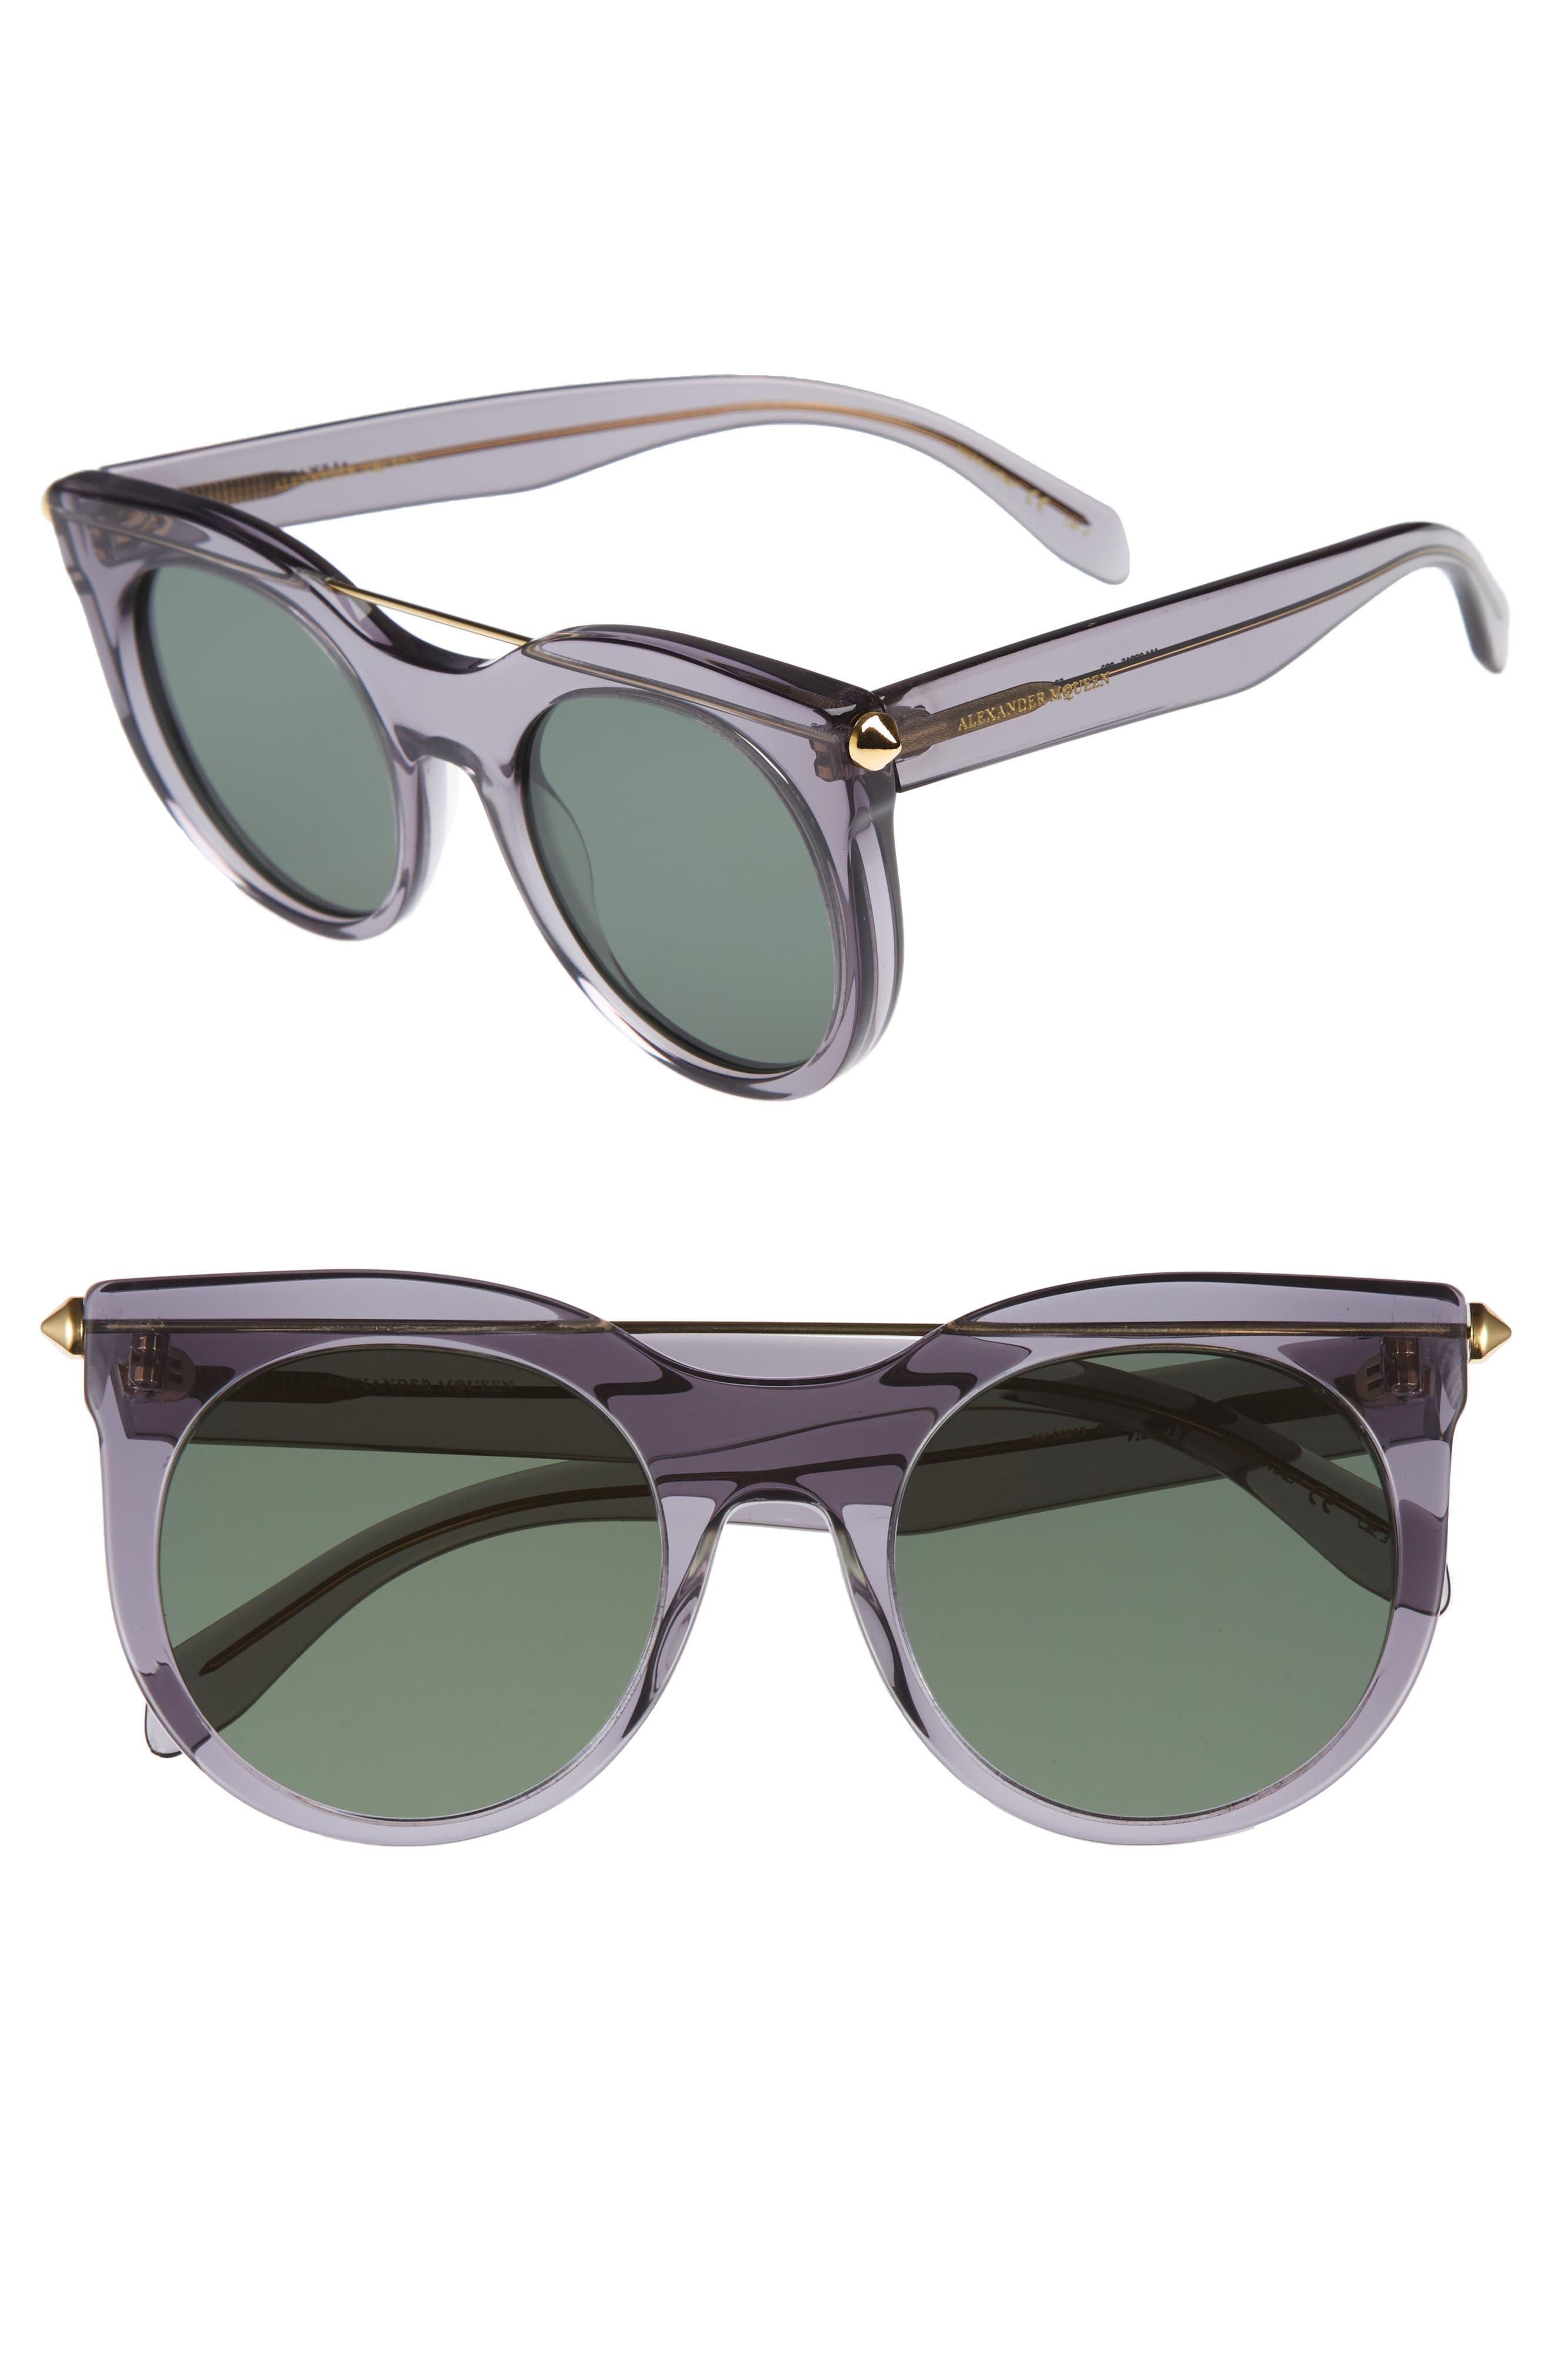 Main Image - Alexander McQueen 52mm Cat Eye Sunglasses